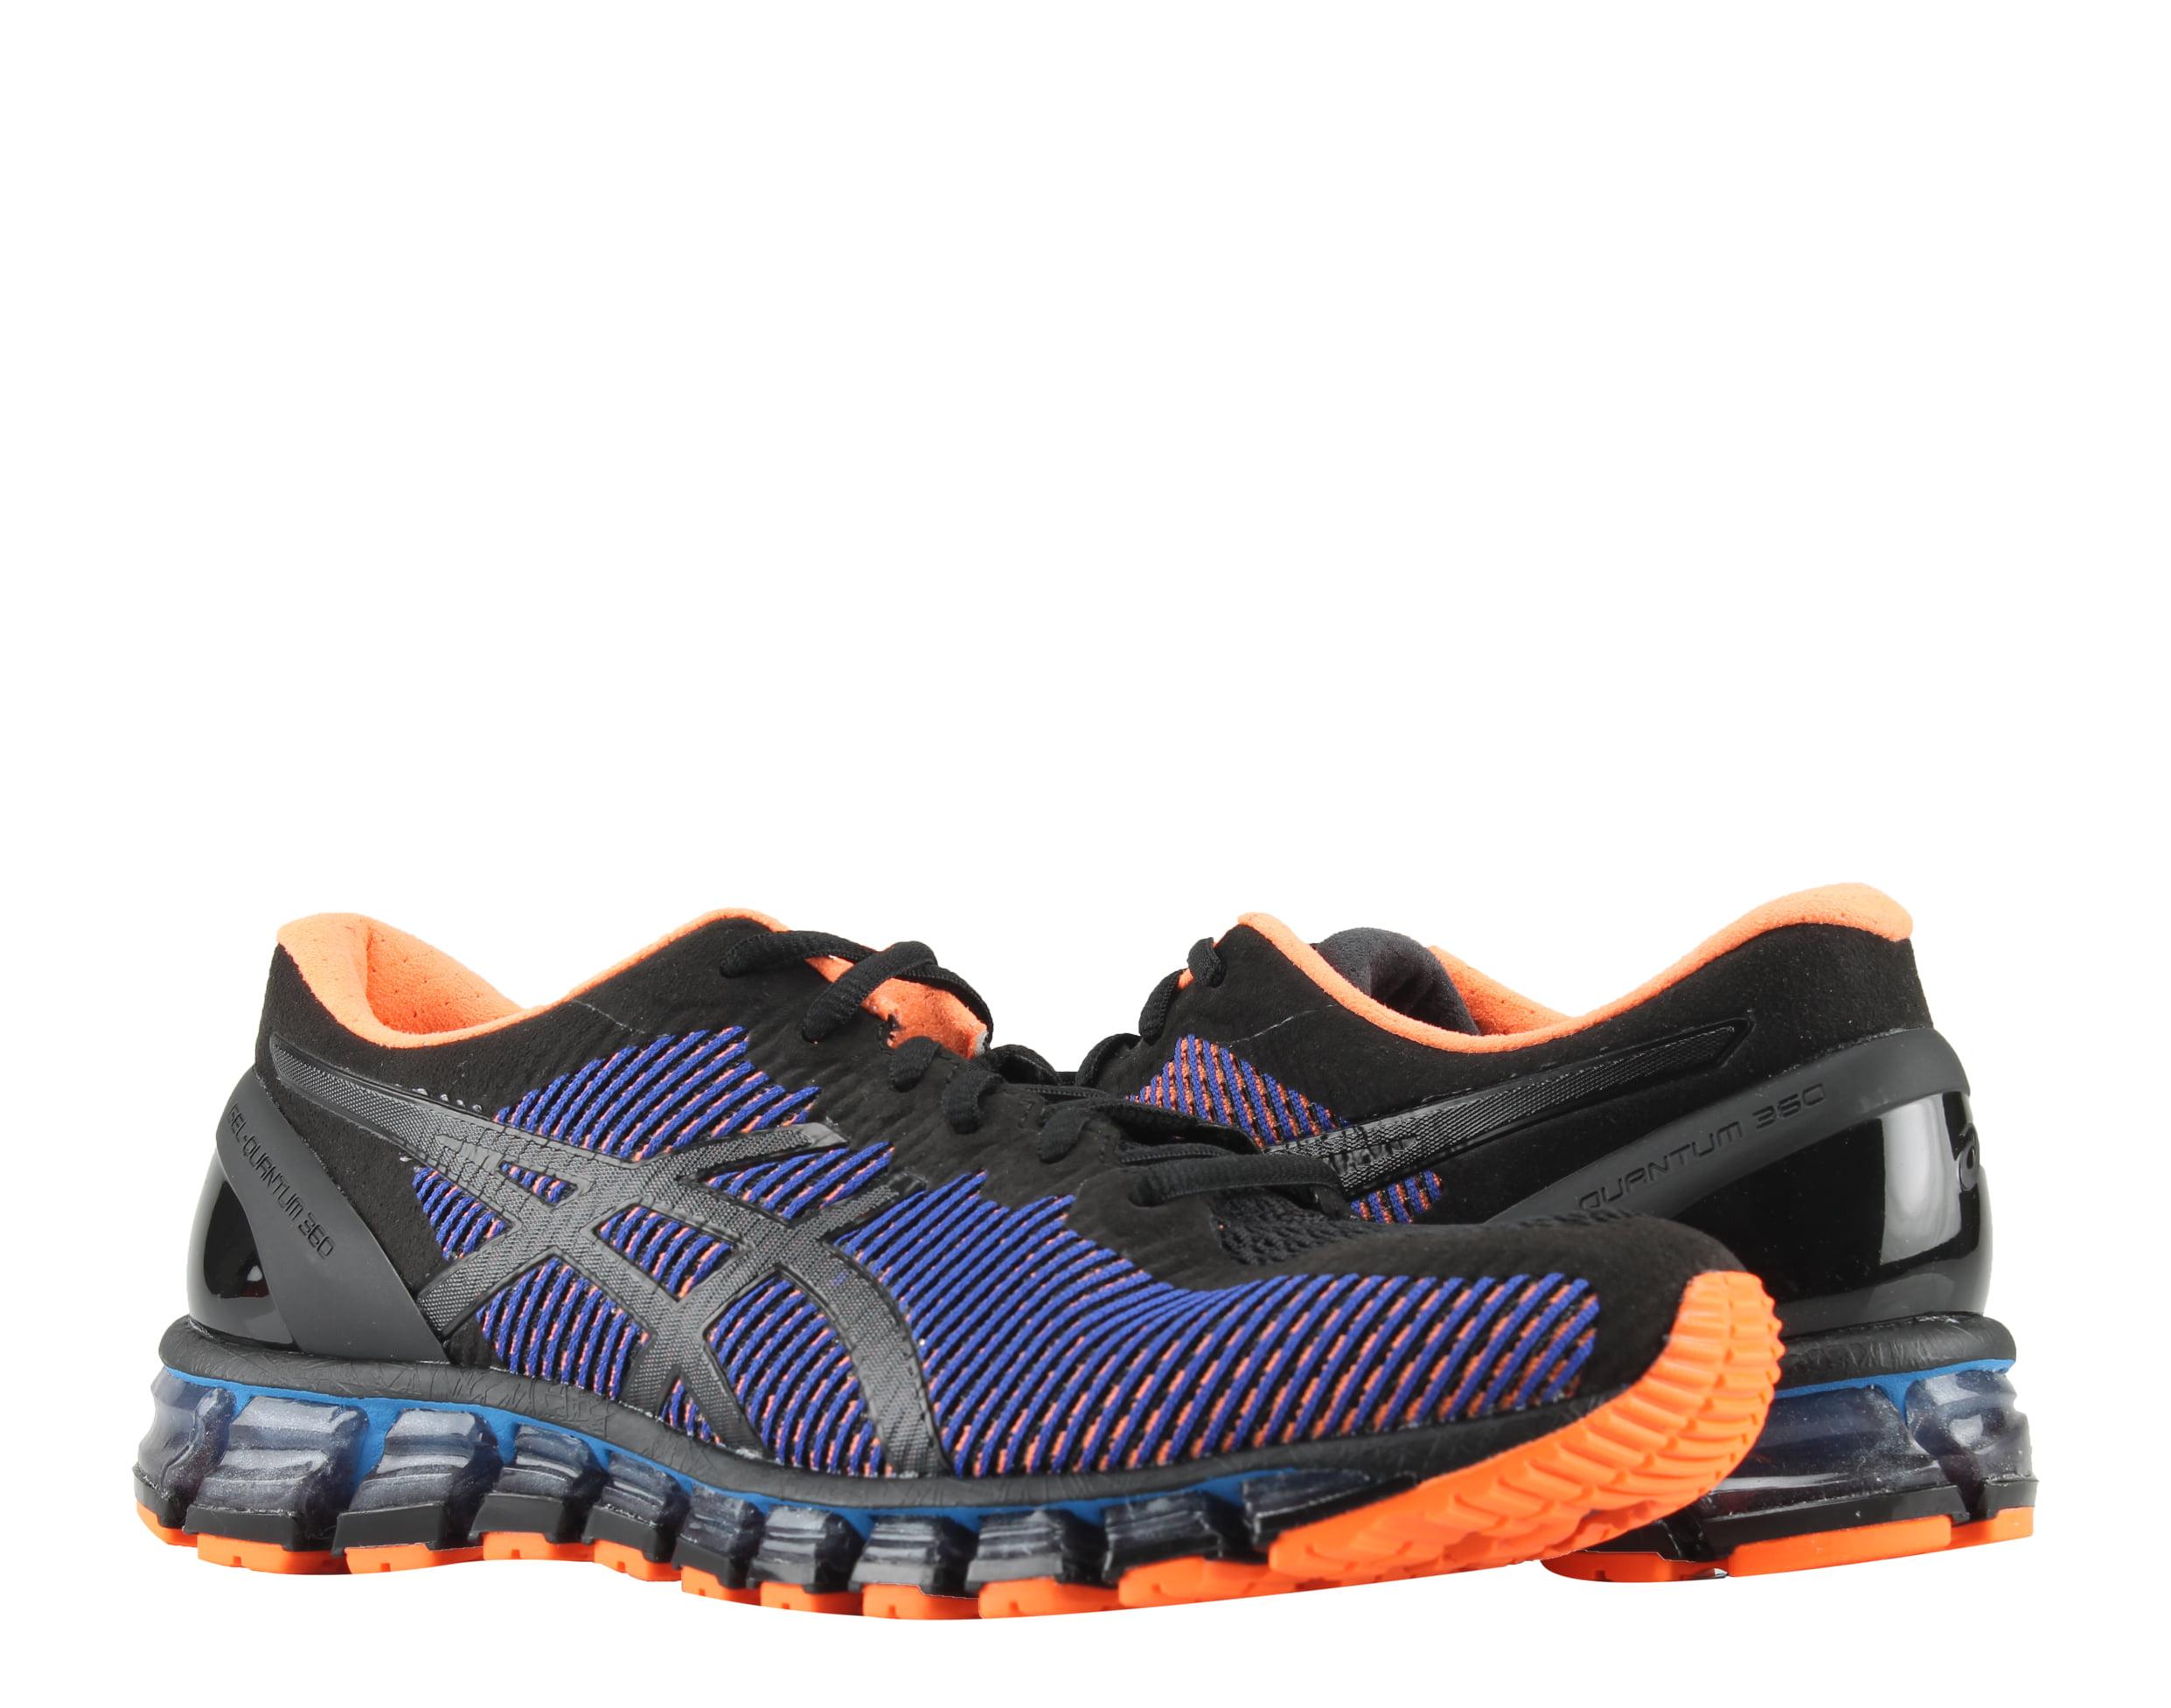 ASICS Asics Gel Quantum 360 CM BlackOnyxHot Orange Men's Running Shoes T6G1N 9099